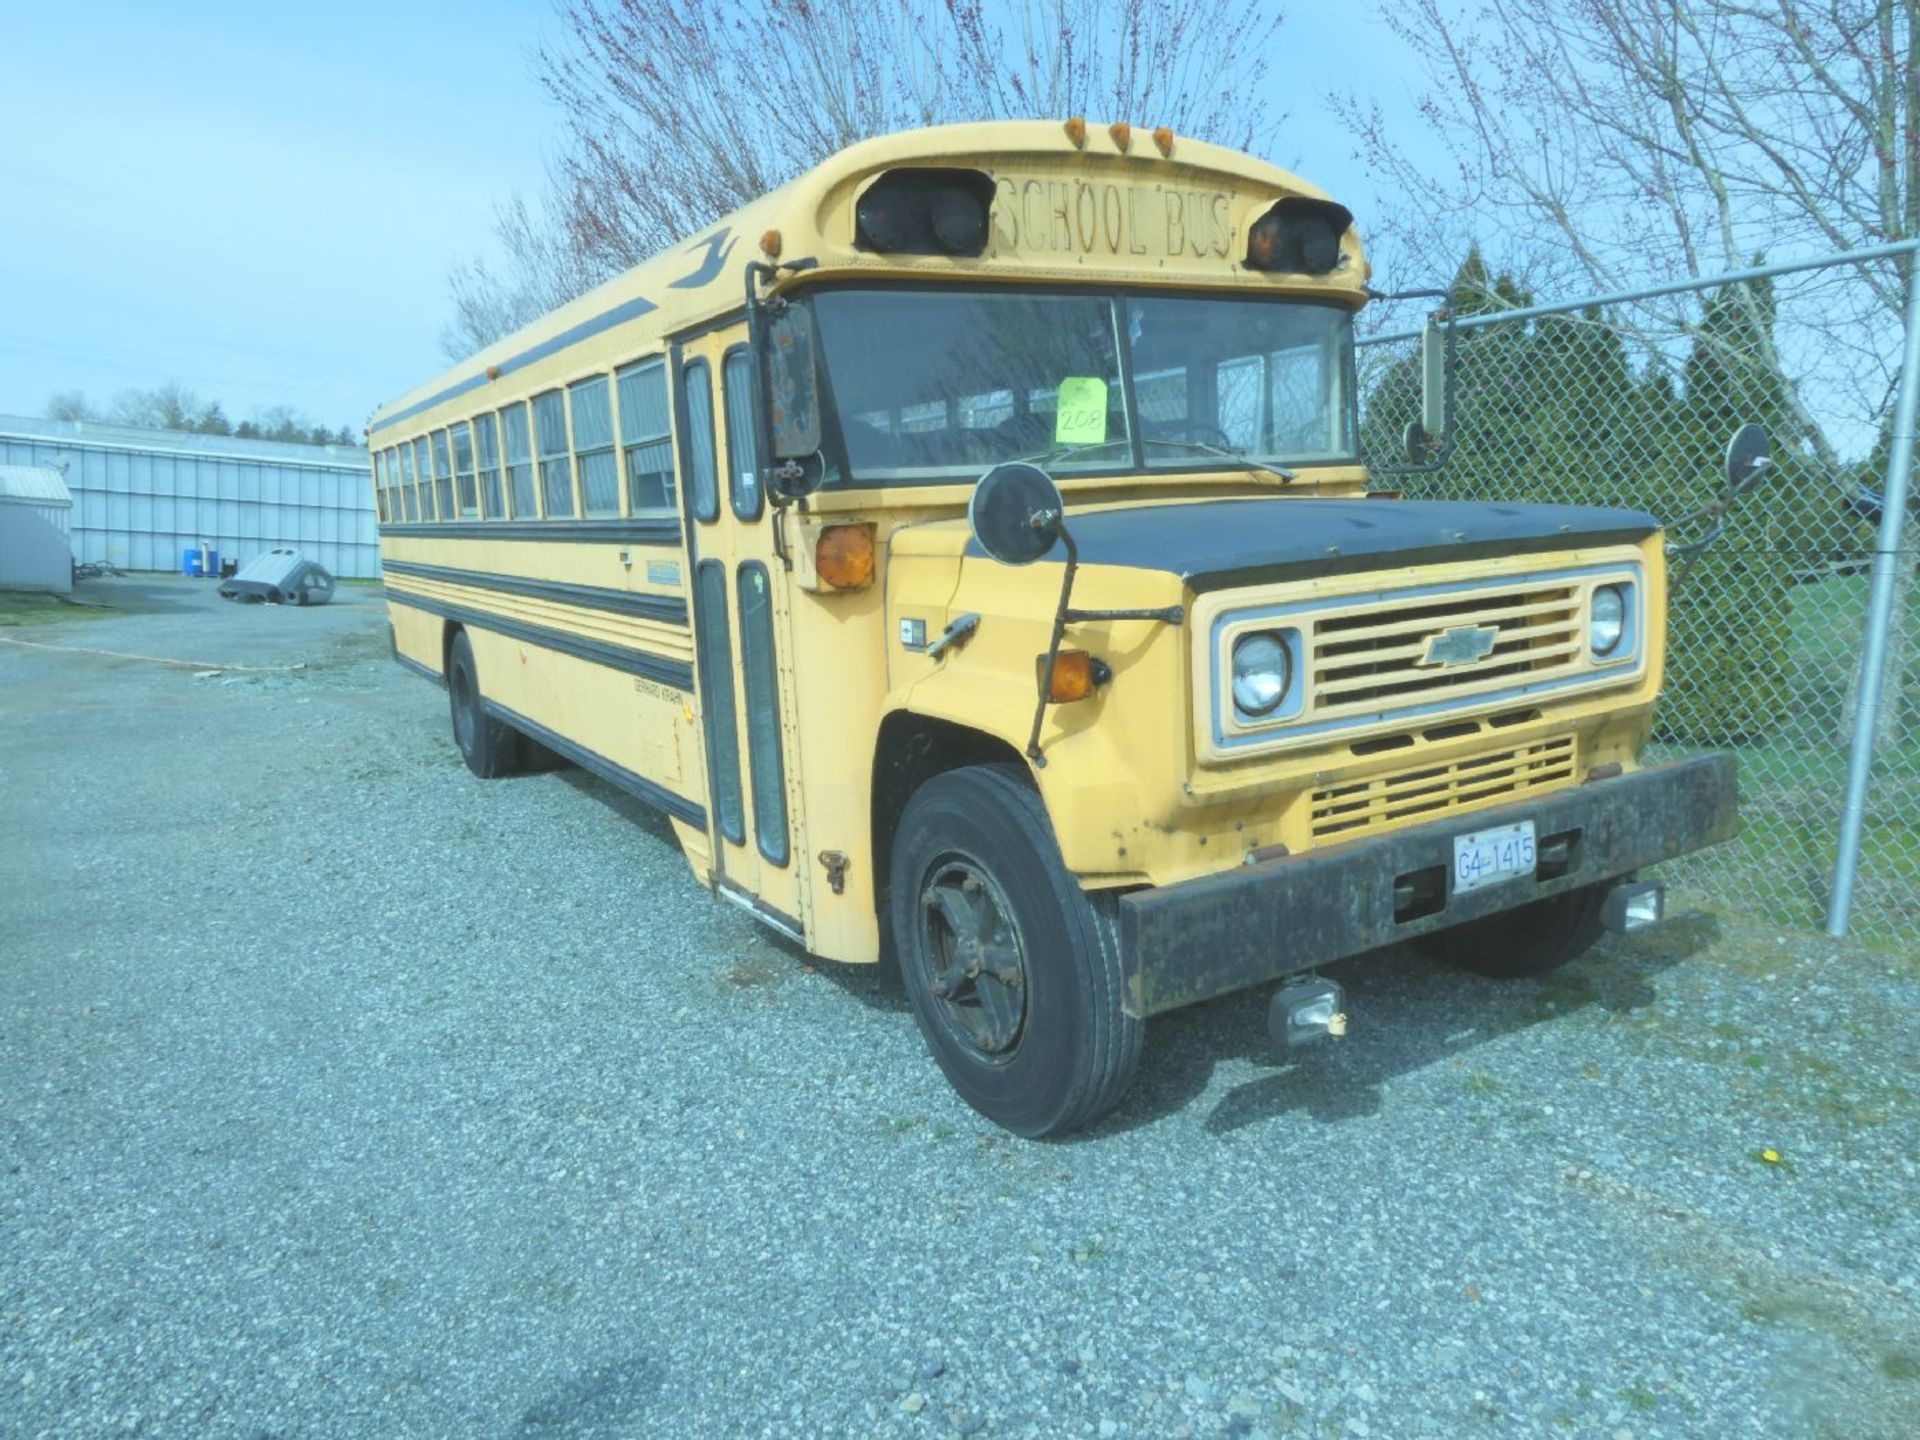 BlueBird School Bus - Image 2 of 4